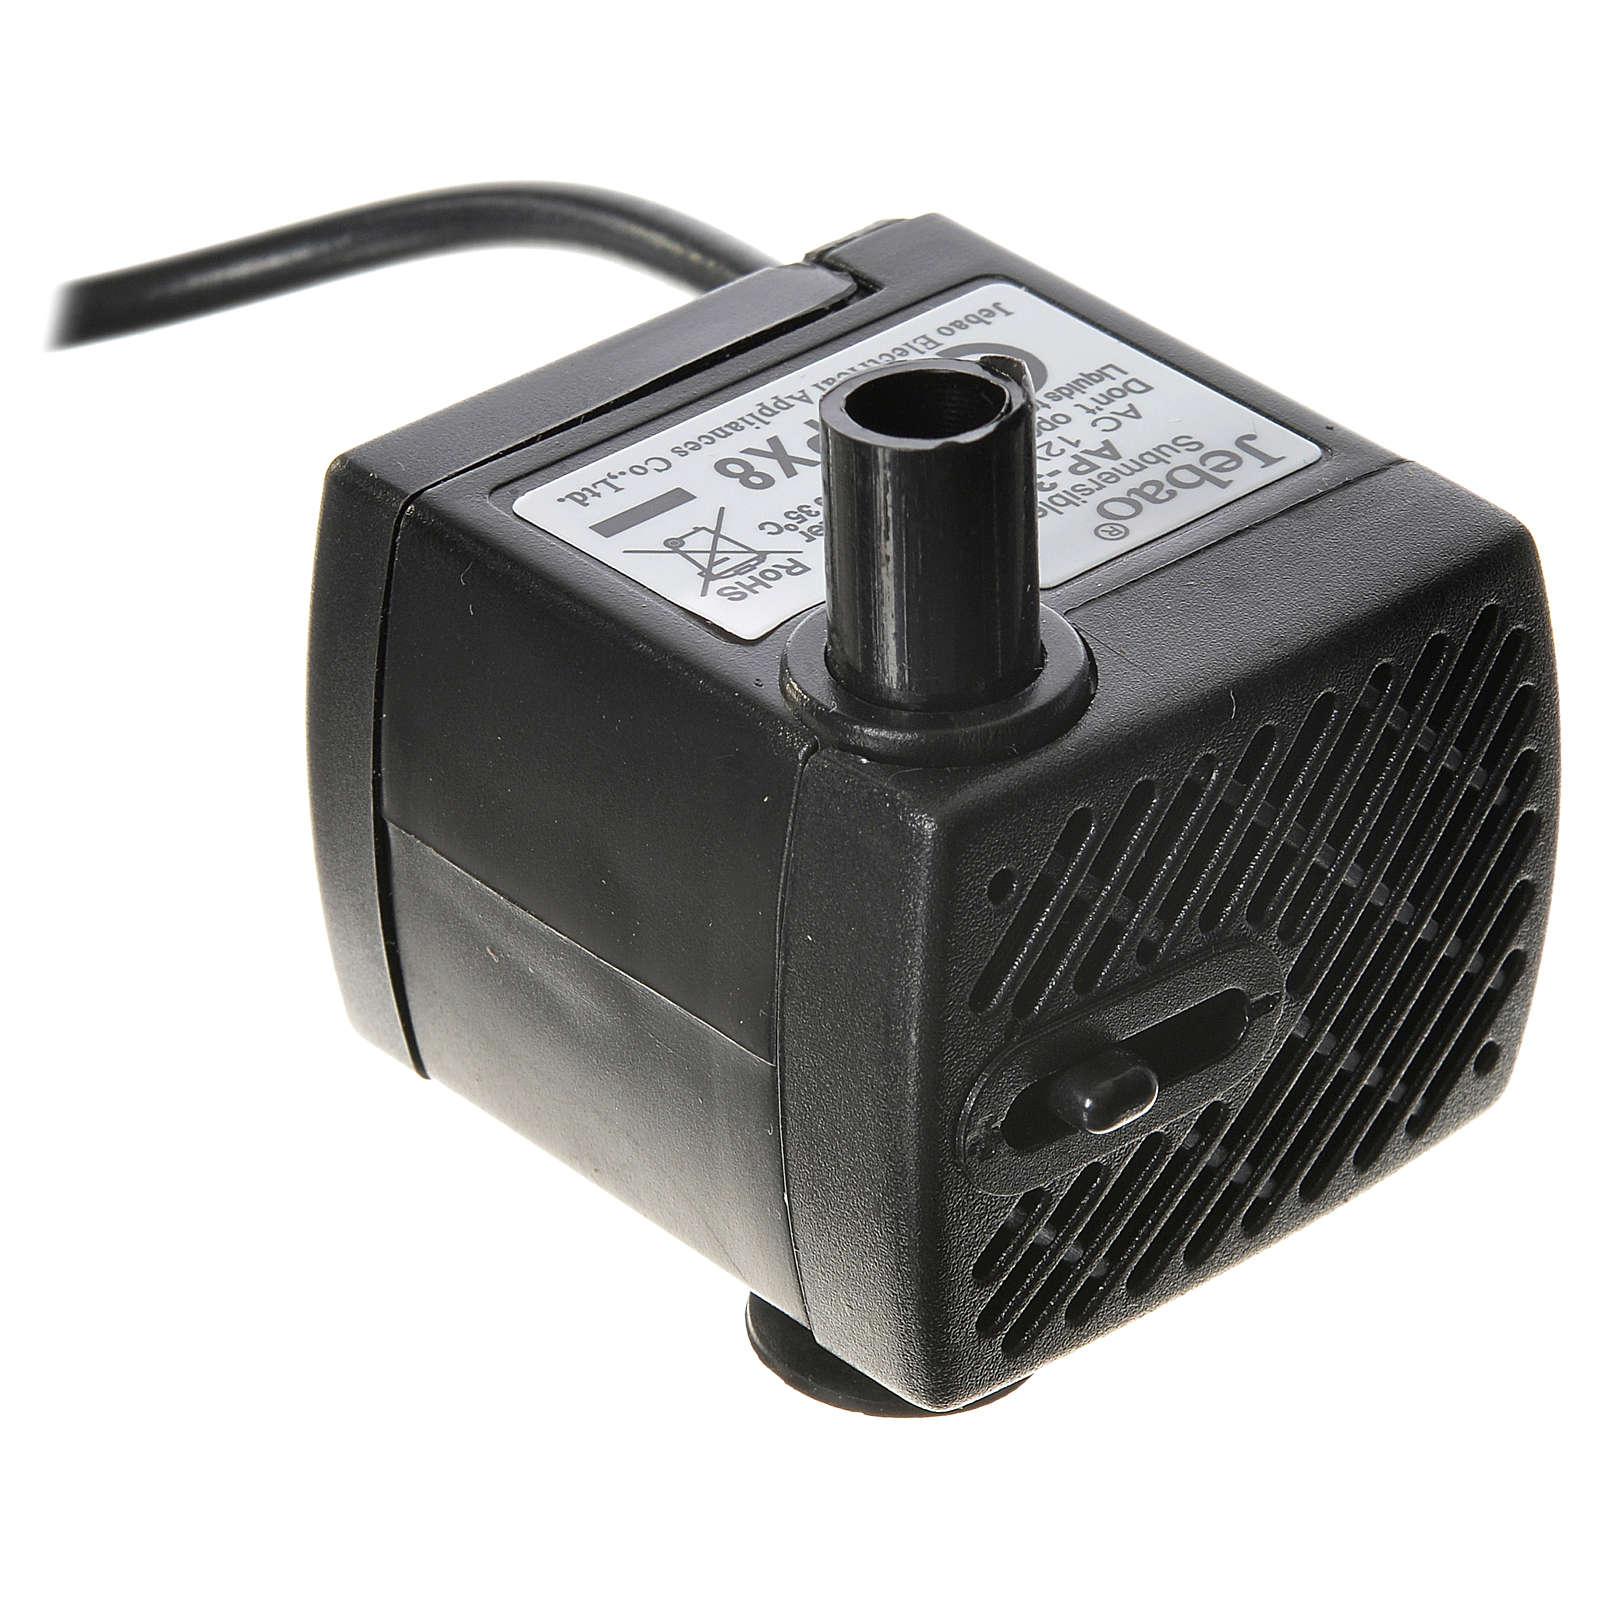 Water pump for nativities, model HK-200L 2W 4